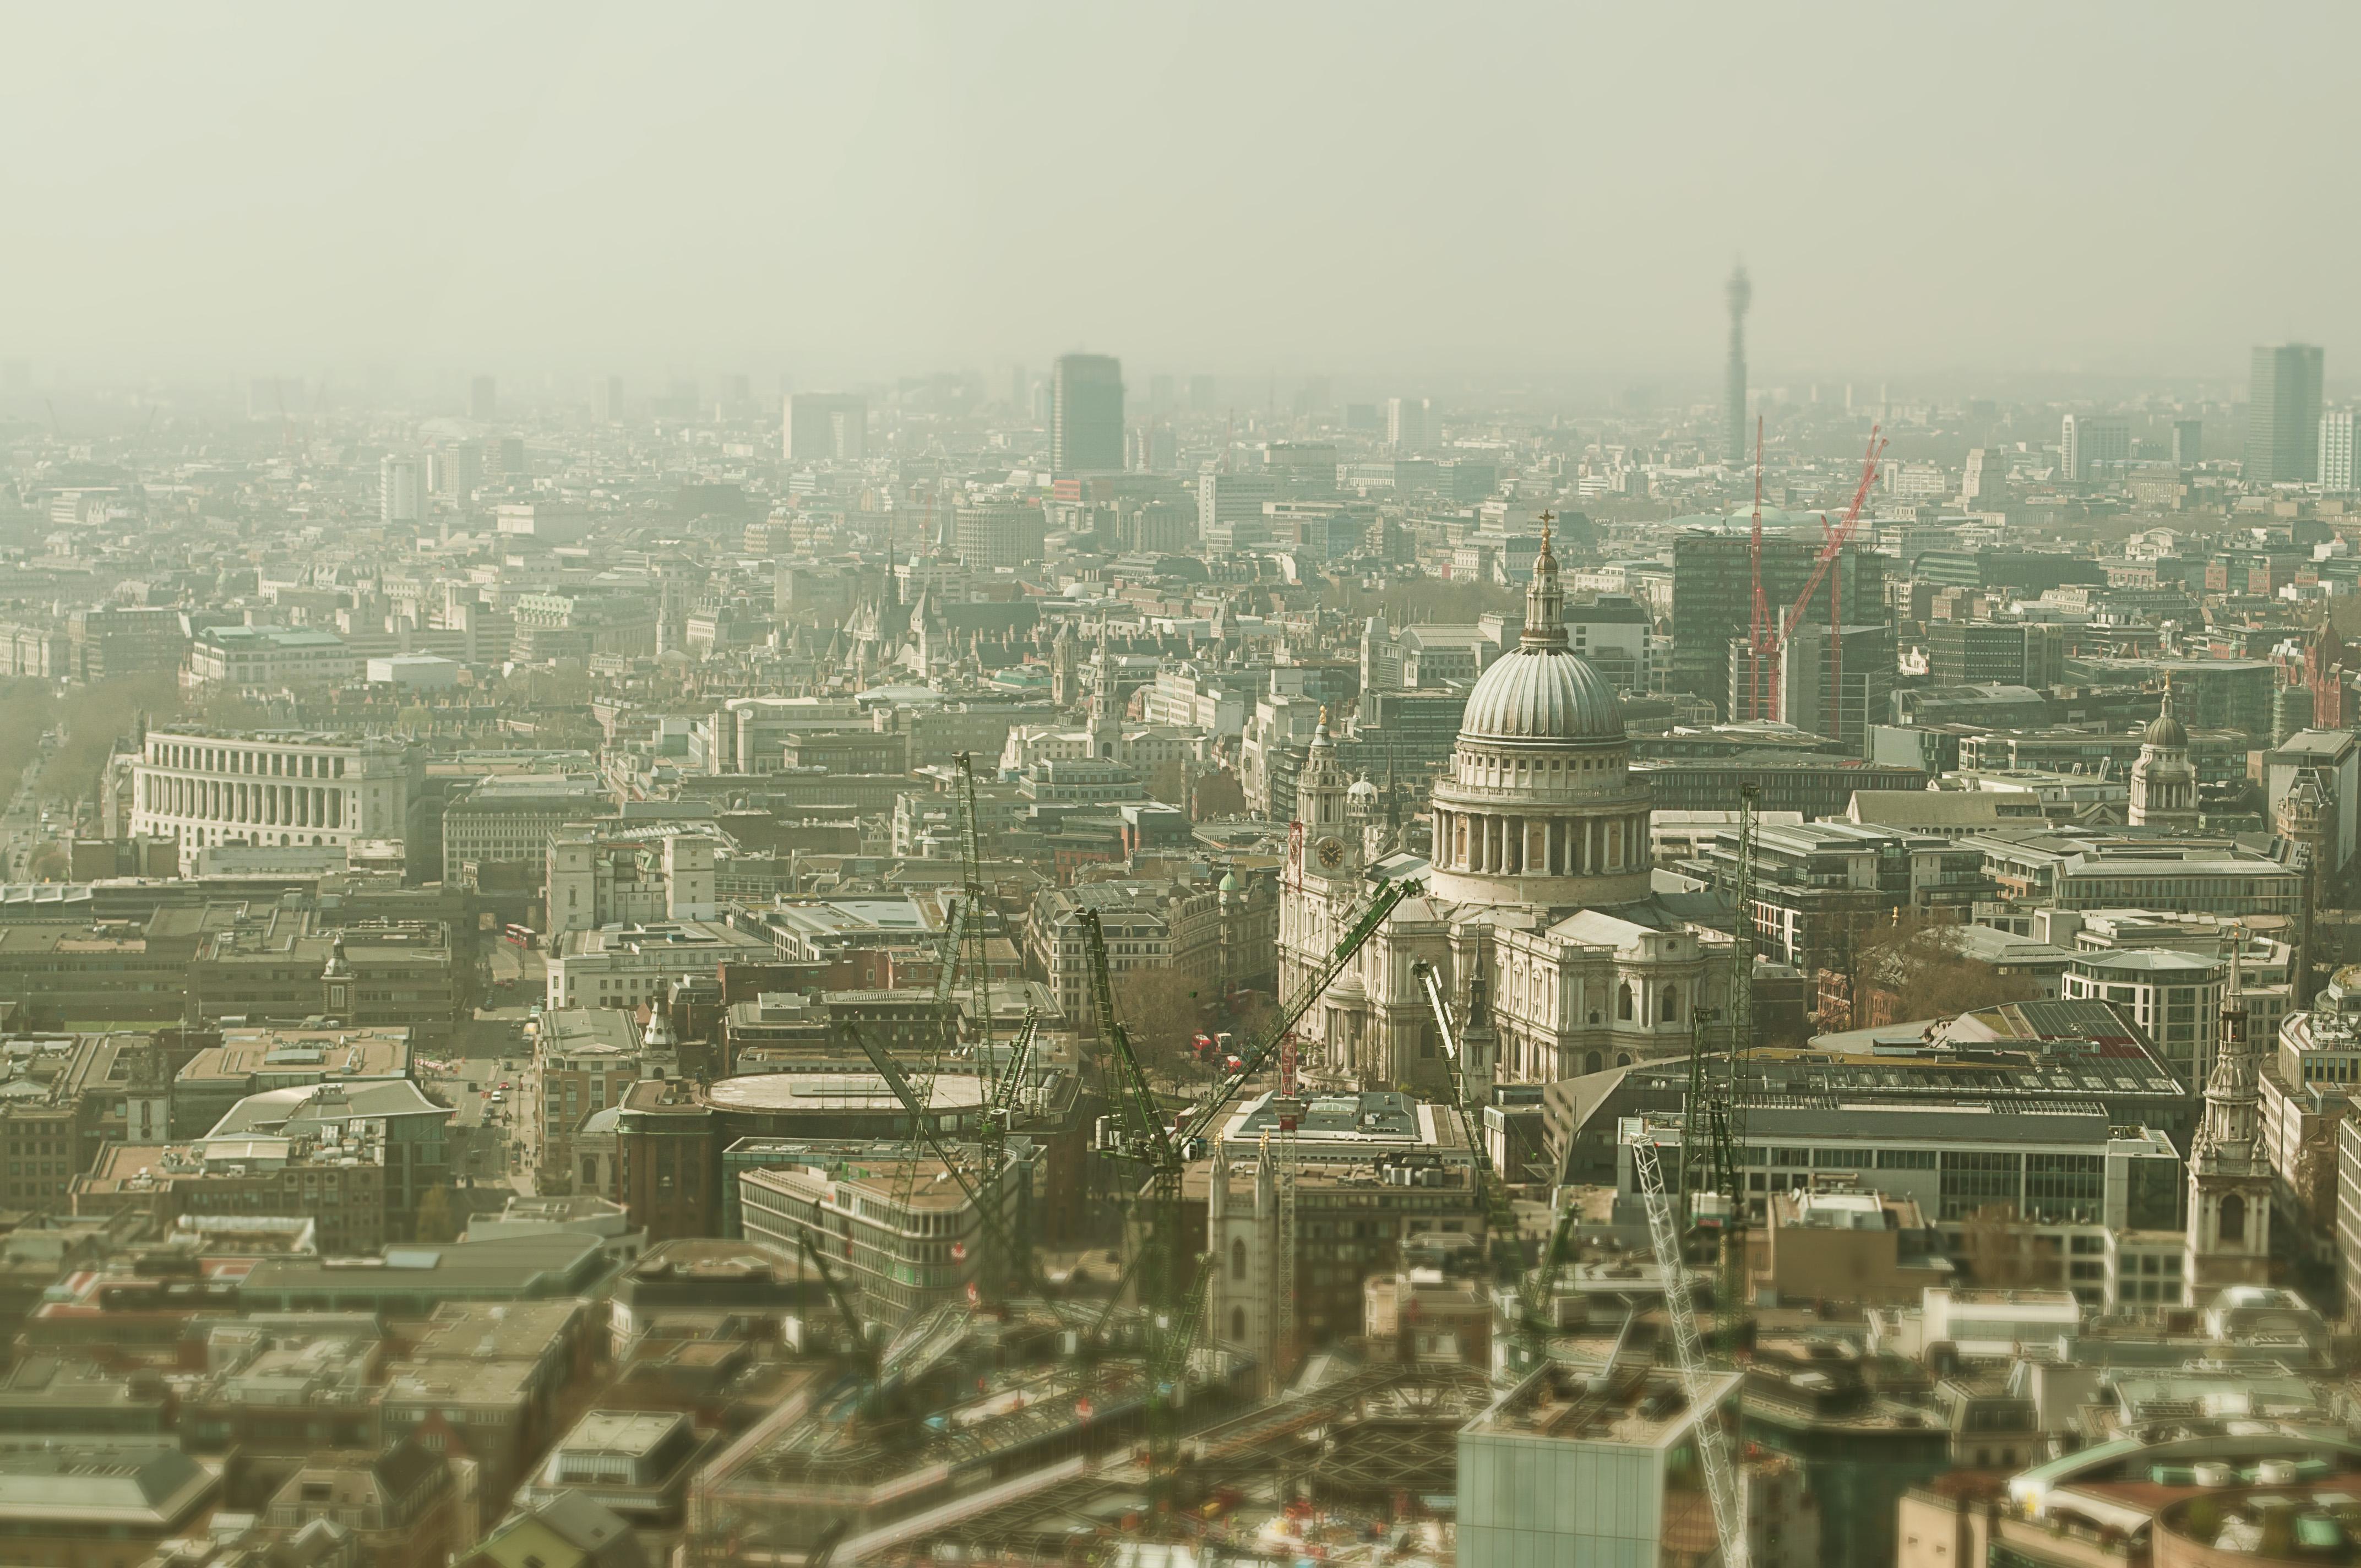 Air pollution in London by Rhys Herbert